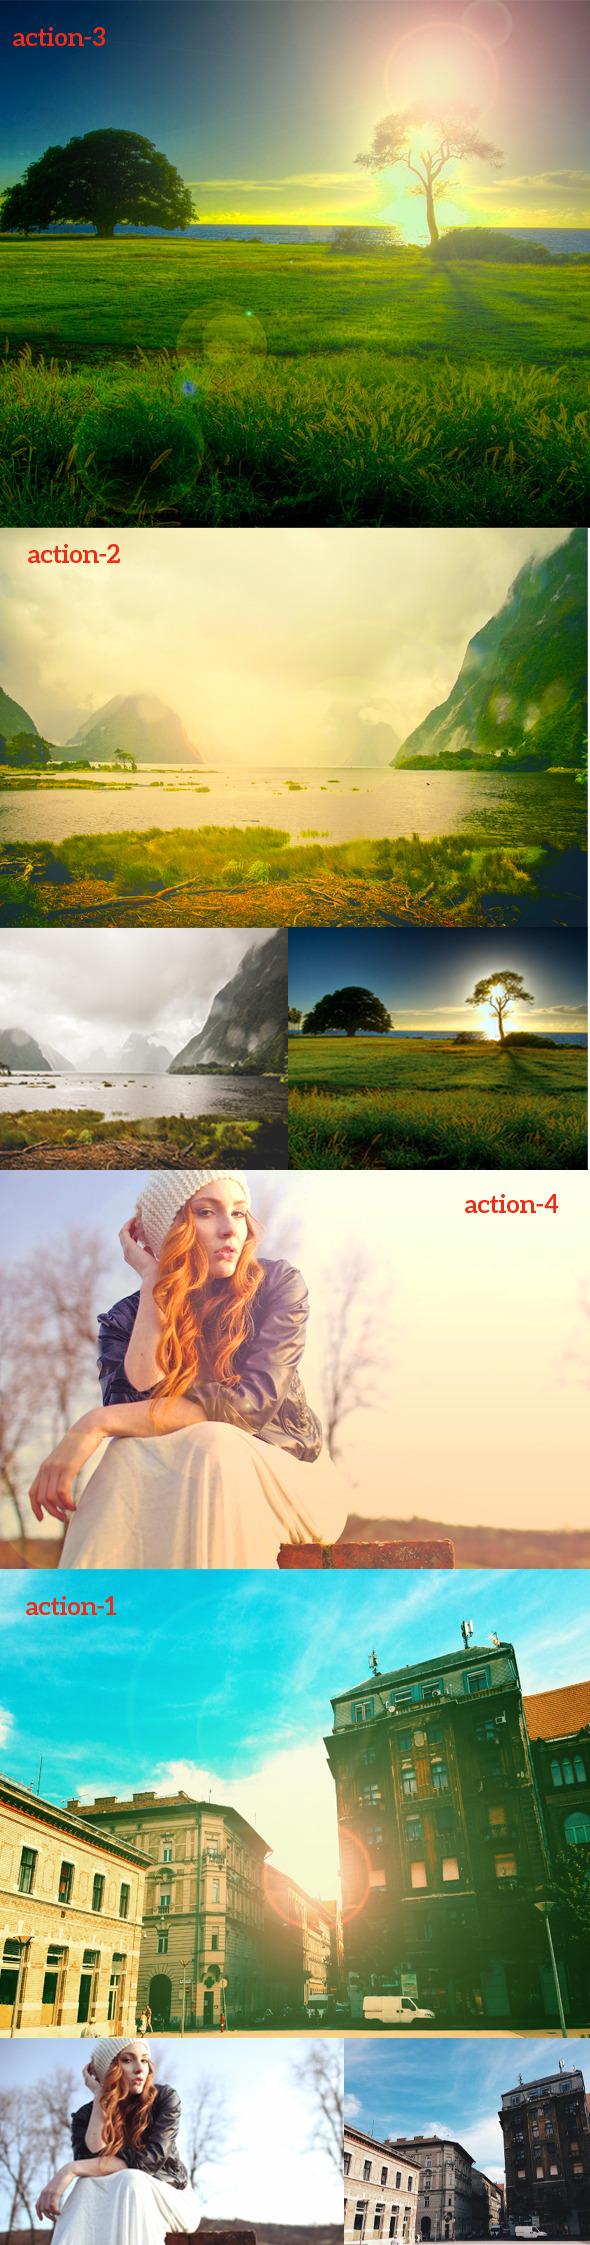 Photos Colou Action - Actions Photoshop